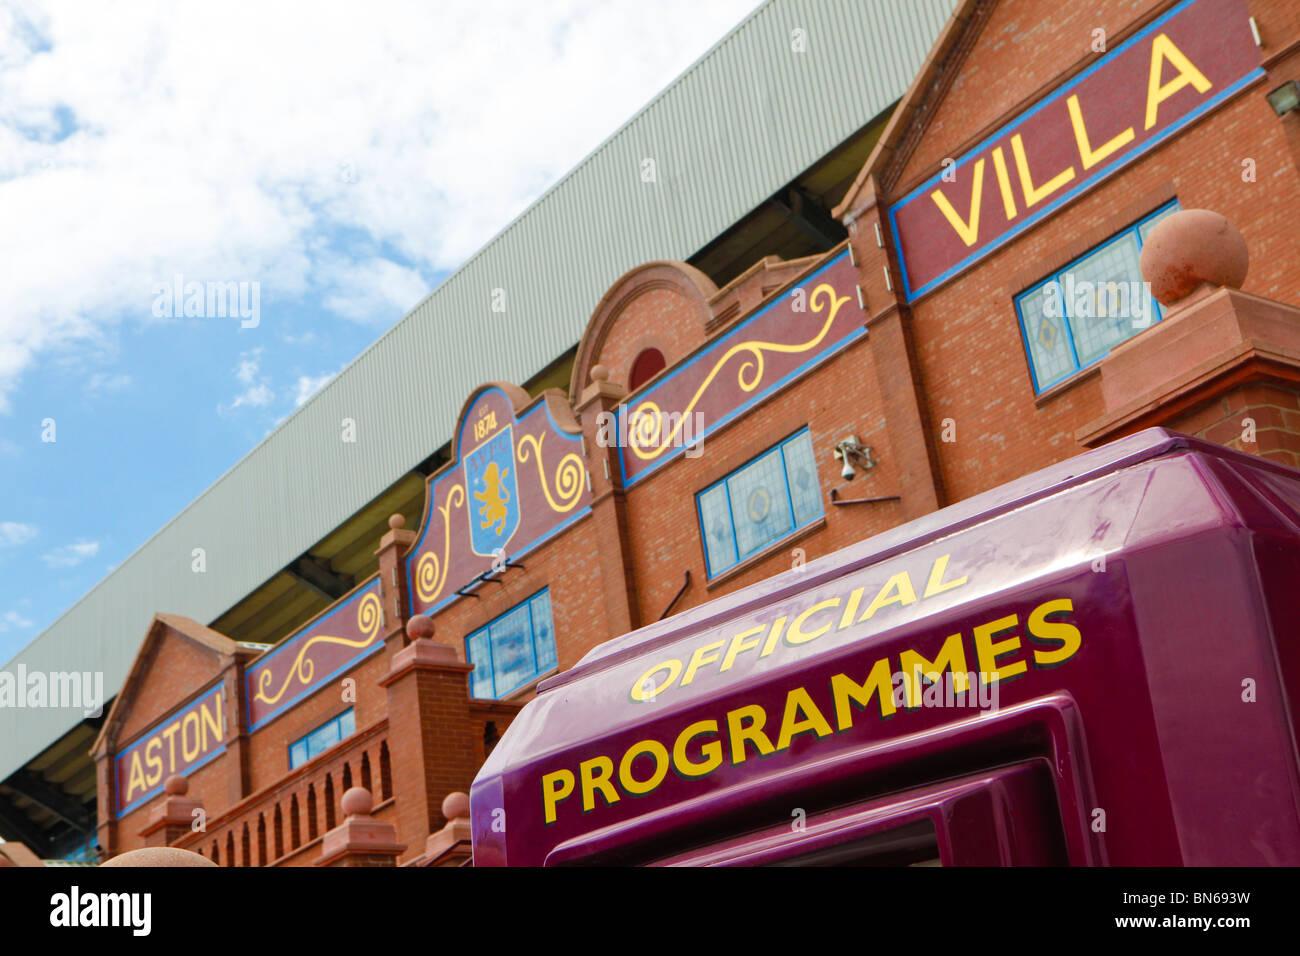 Aston Villa Football Club, Birmingham - Stock Image